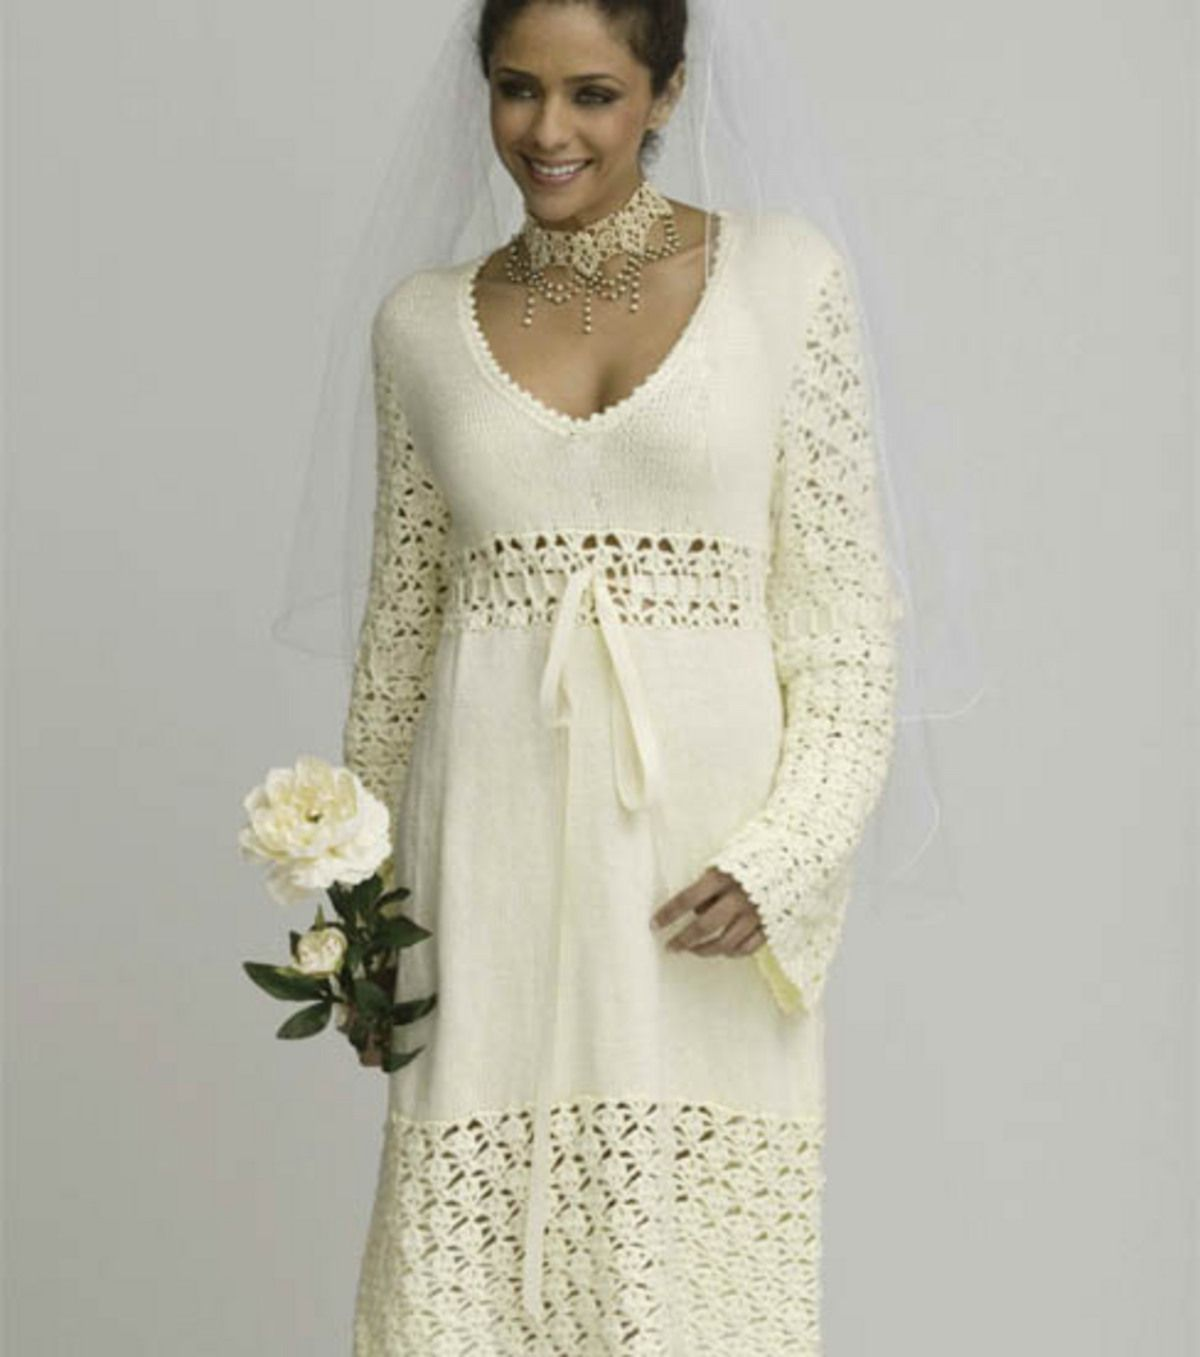 crochet wedding dress patterns and wedding accessories to crochet free crochet crochet and. Black Bedroom Furniture Sets. Home Design Ideas